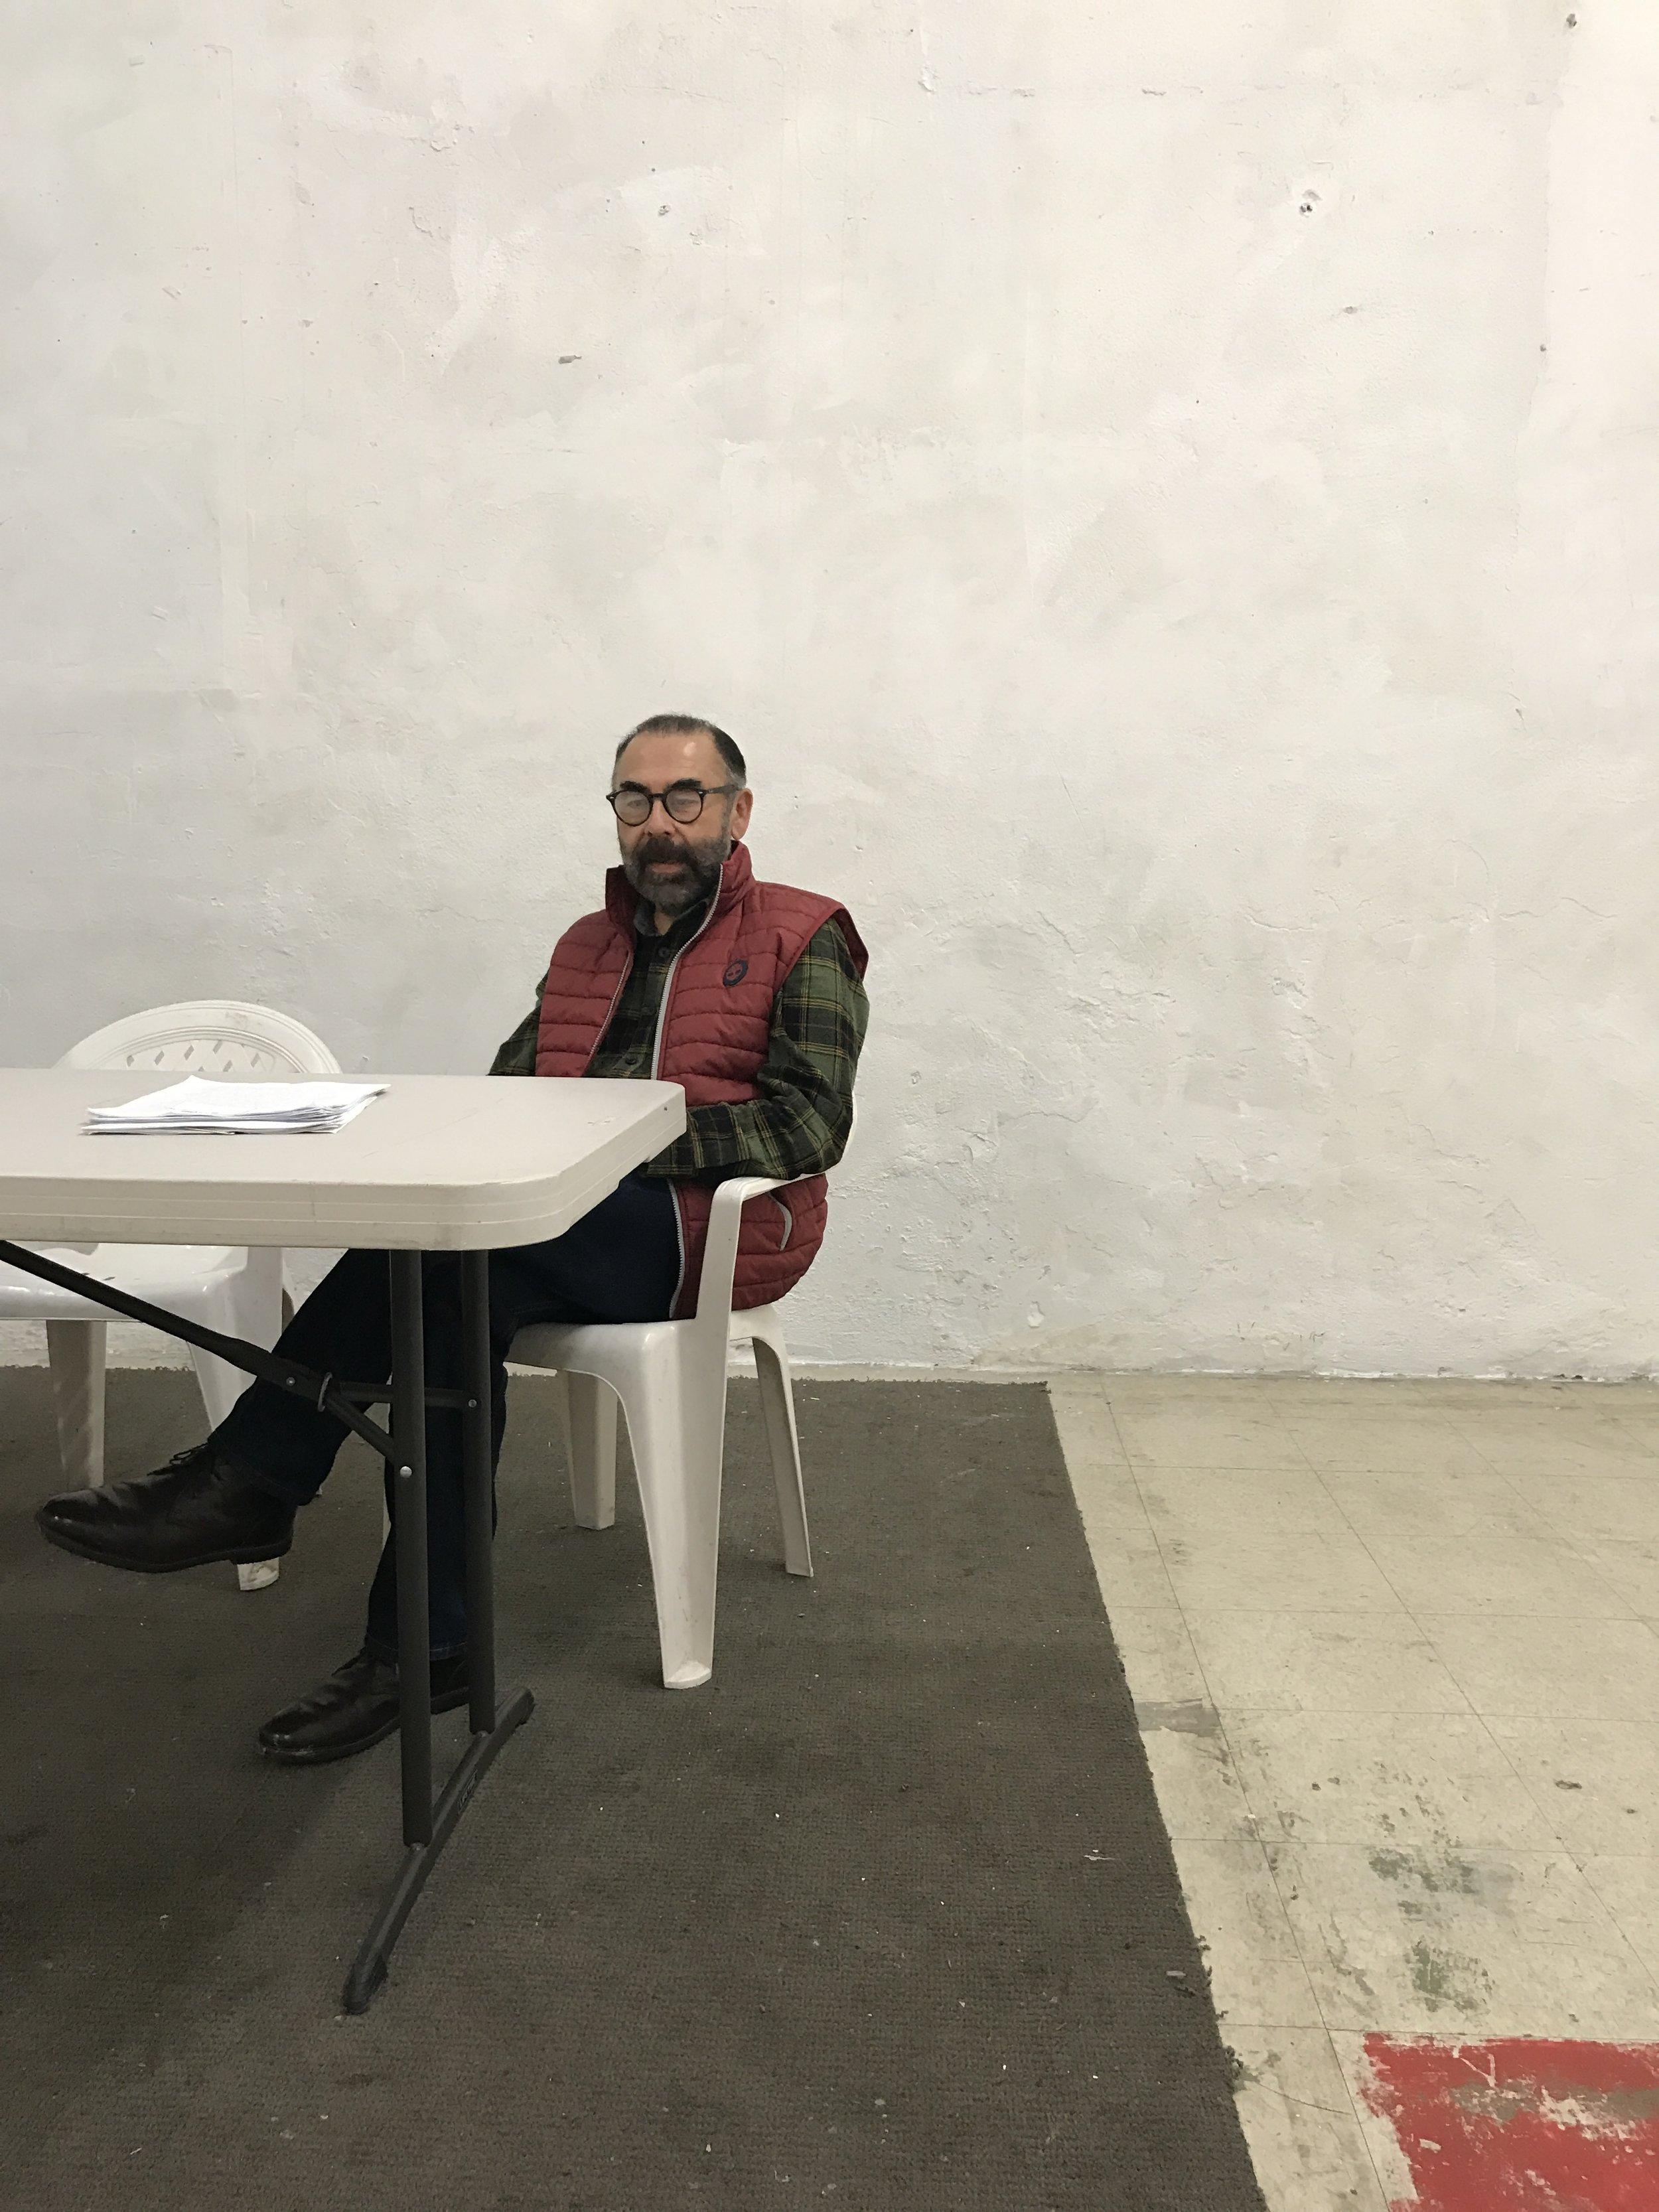 Victor Alfaro-Clark, Centro Binacional de Derechos Humanos director, leads a group of San Diego State University students through bi-national civil right discussions in Tijuana, Baja California.  Photo by Marlyn Carrillo